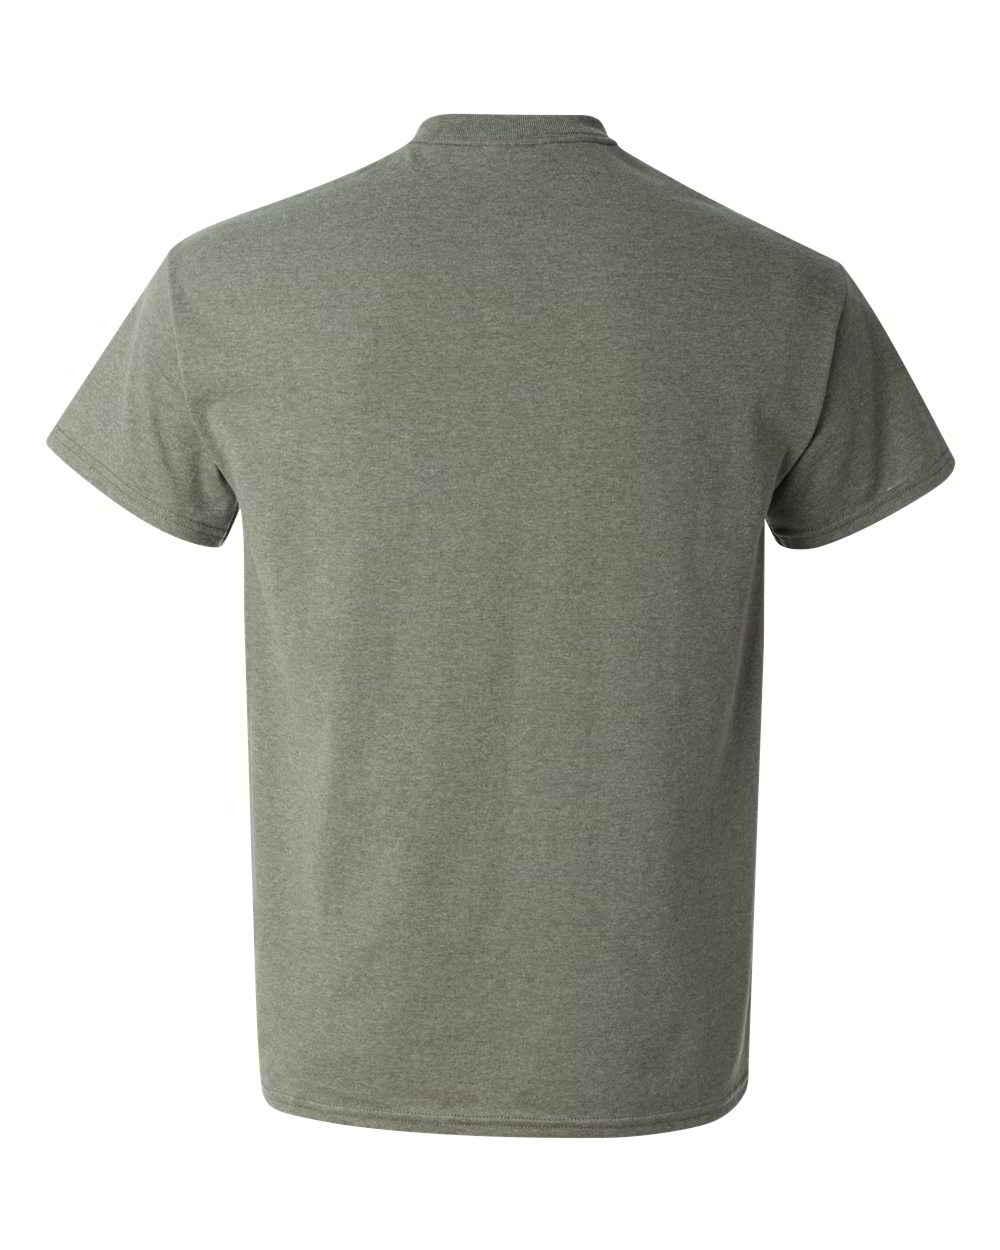 Gildan-Heavy-Cotton-Short-Sleeve-Mens-Green-T-Shirts-5000 thumbnail 11